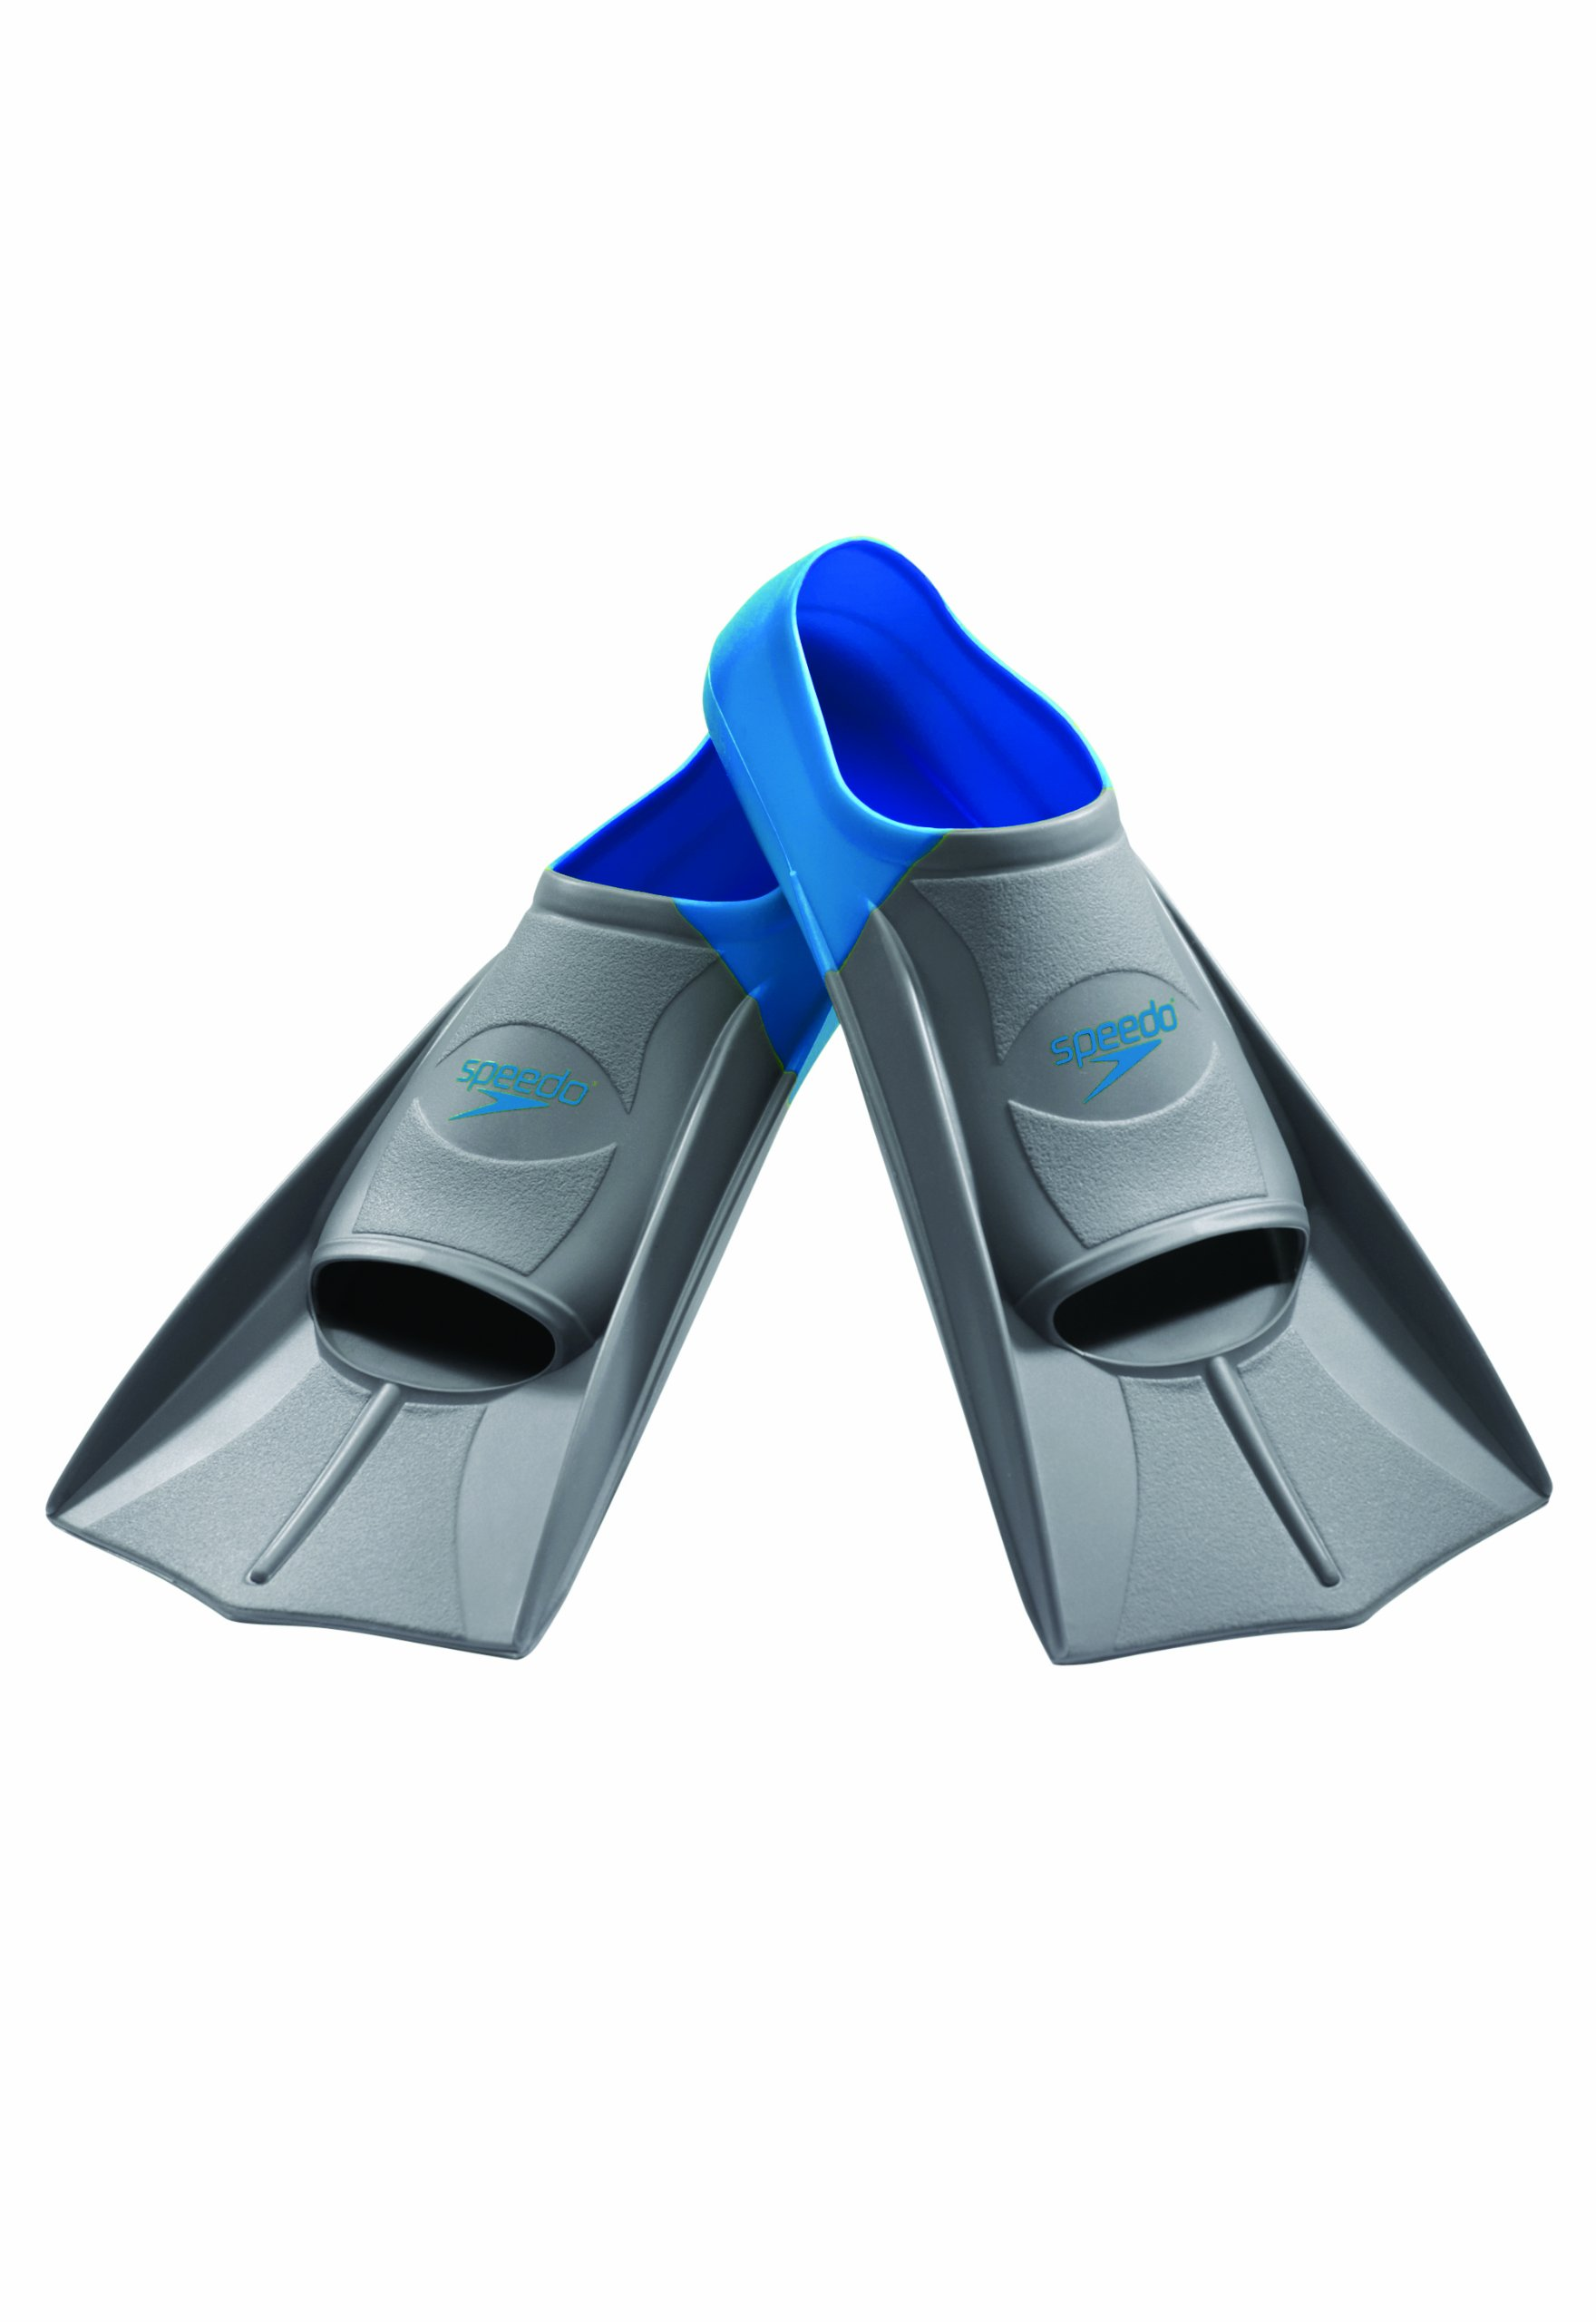 Speedo Short Blade Swim Training Fins, Blue, Medium by Speedo (Image #1)